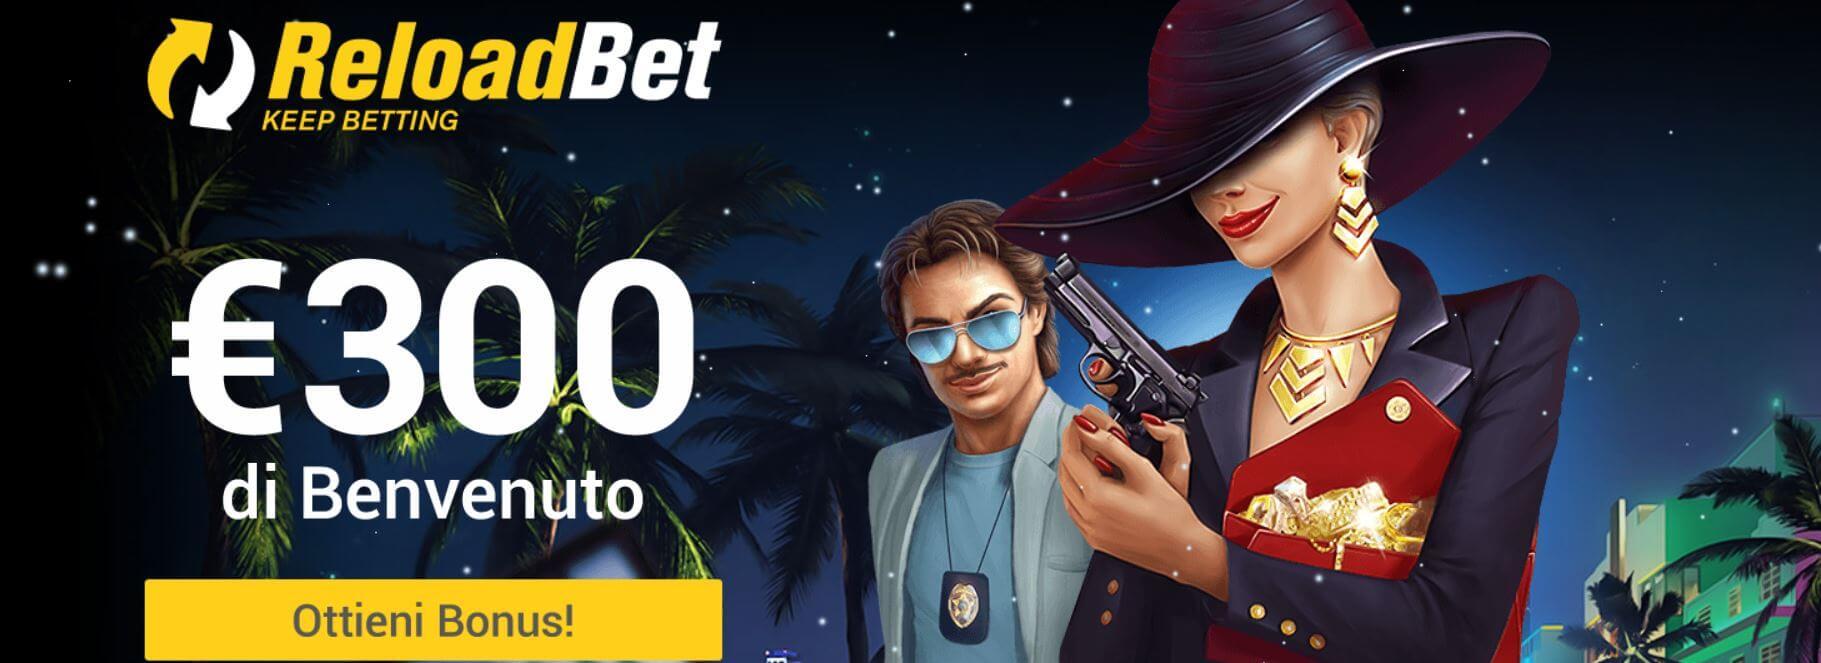 reloadbet casino bonus benvenuto